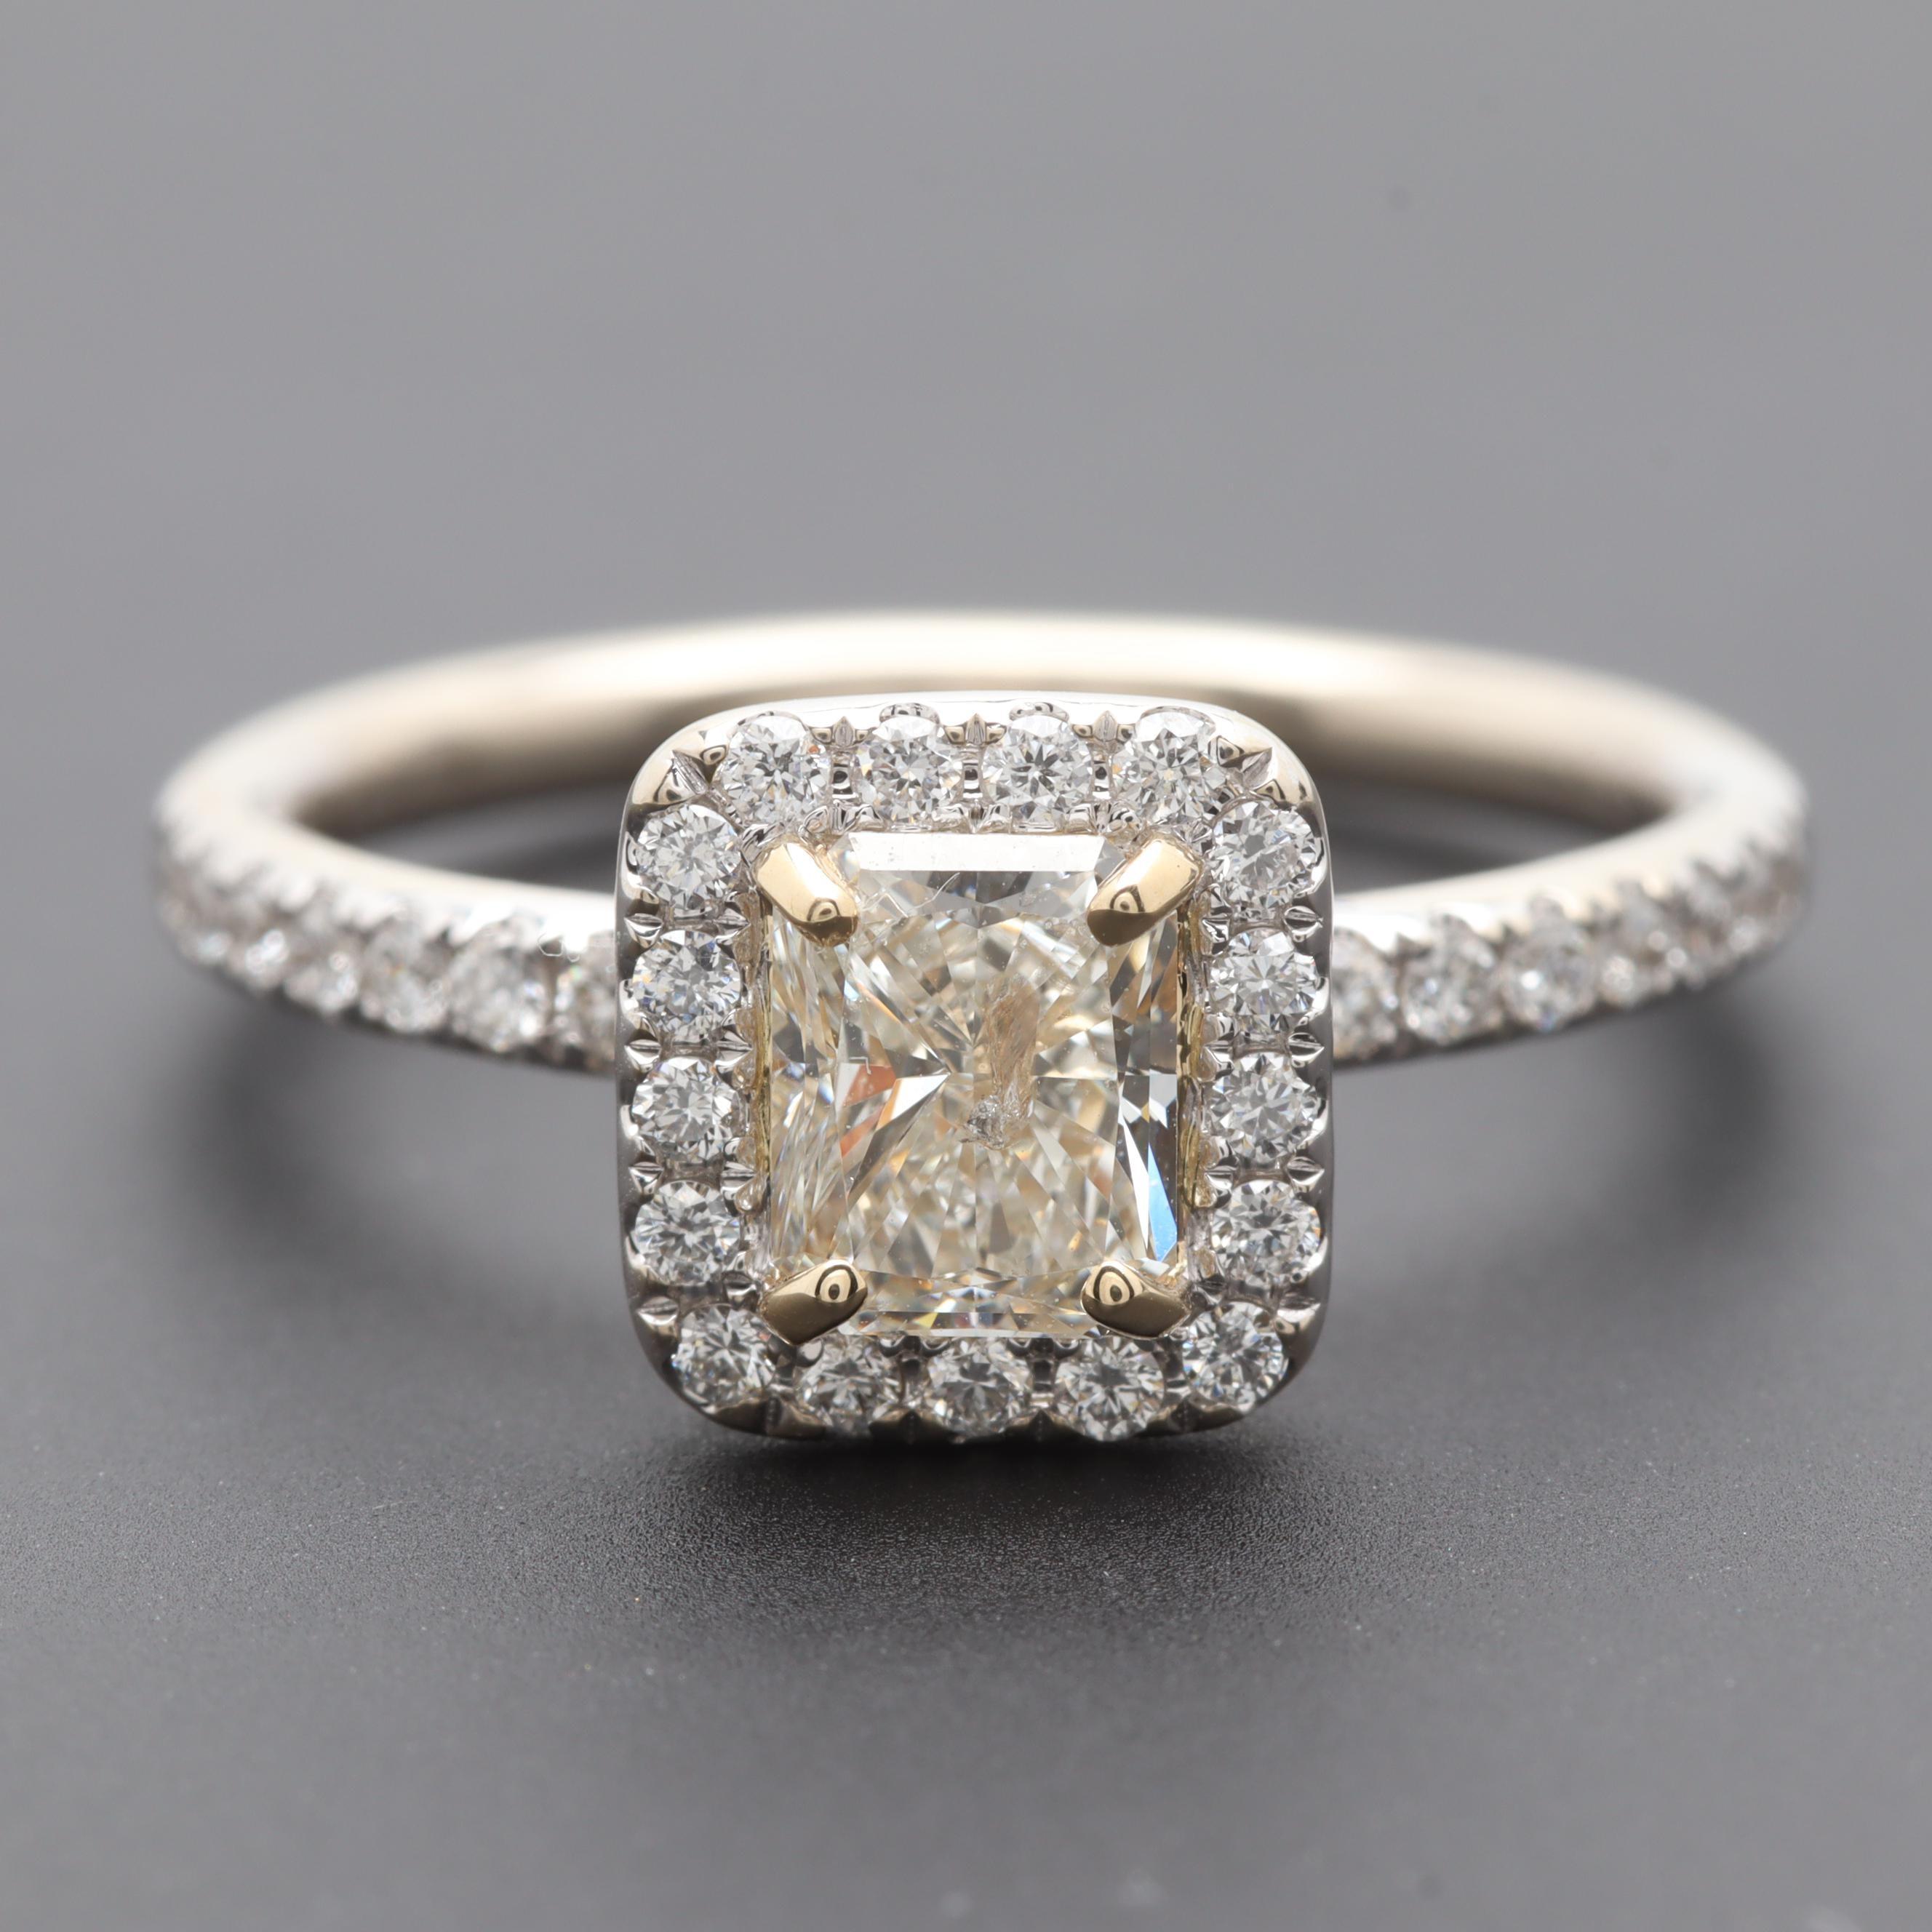 14K White Gold 1.02 CTW Diamond Ring